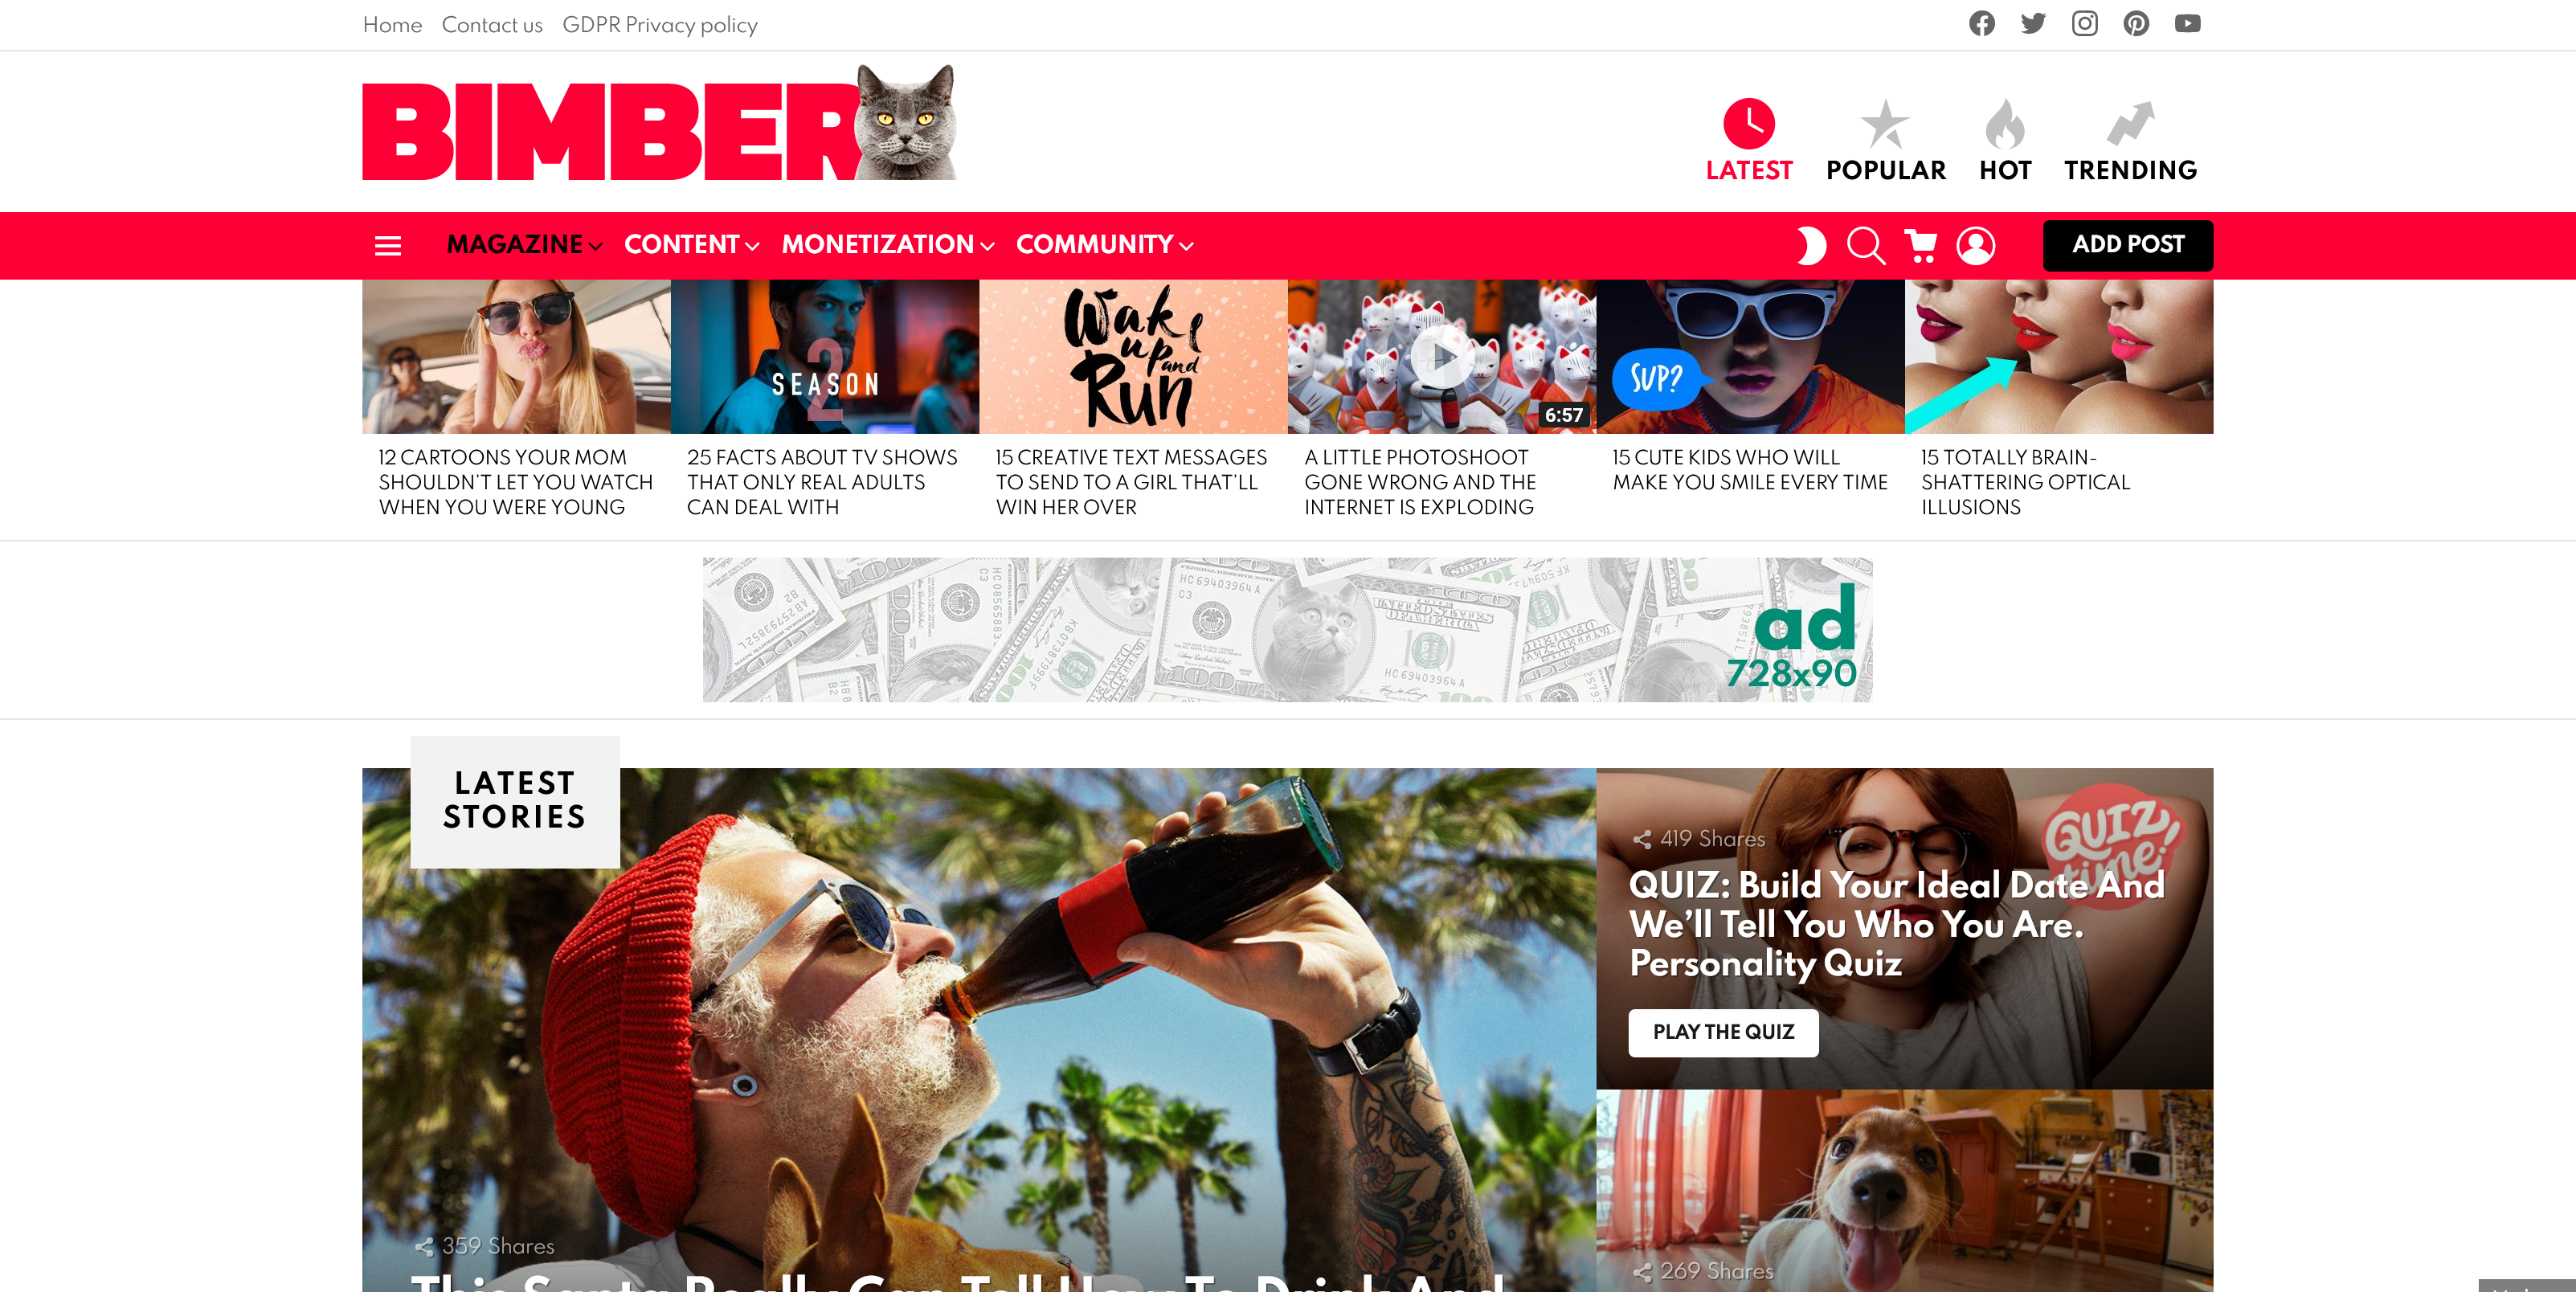 Bimber 9.1.1 – Viral Magazine WordPress Theme